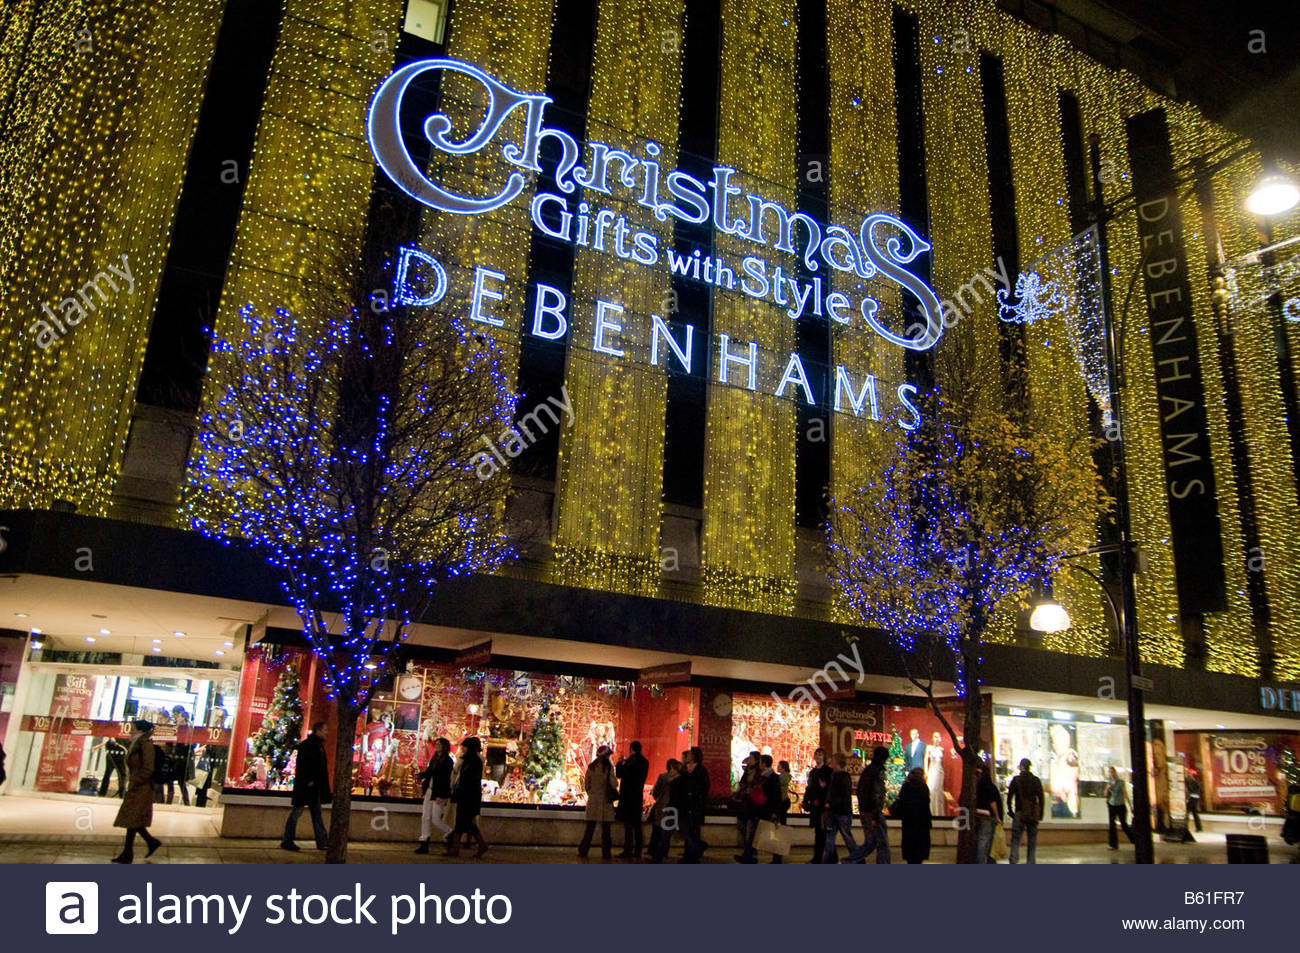 2019 year for women- Christmas debenhams decorations